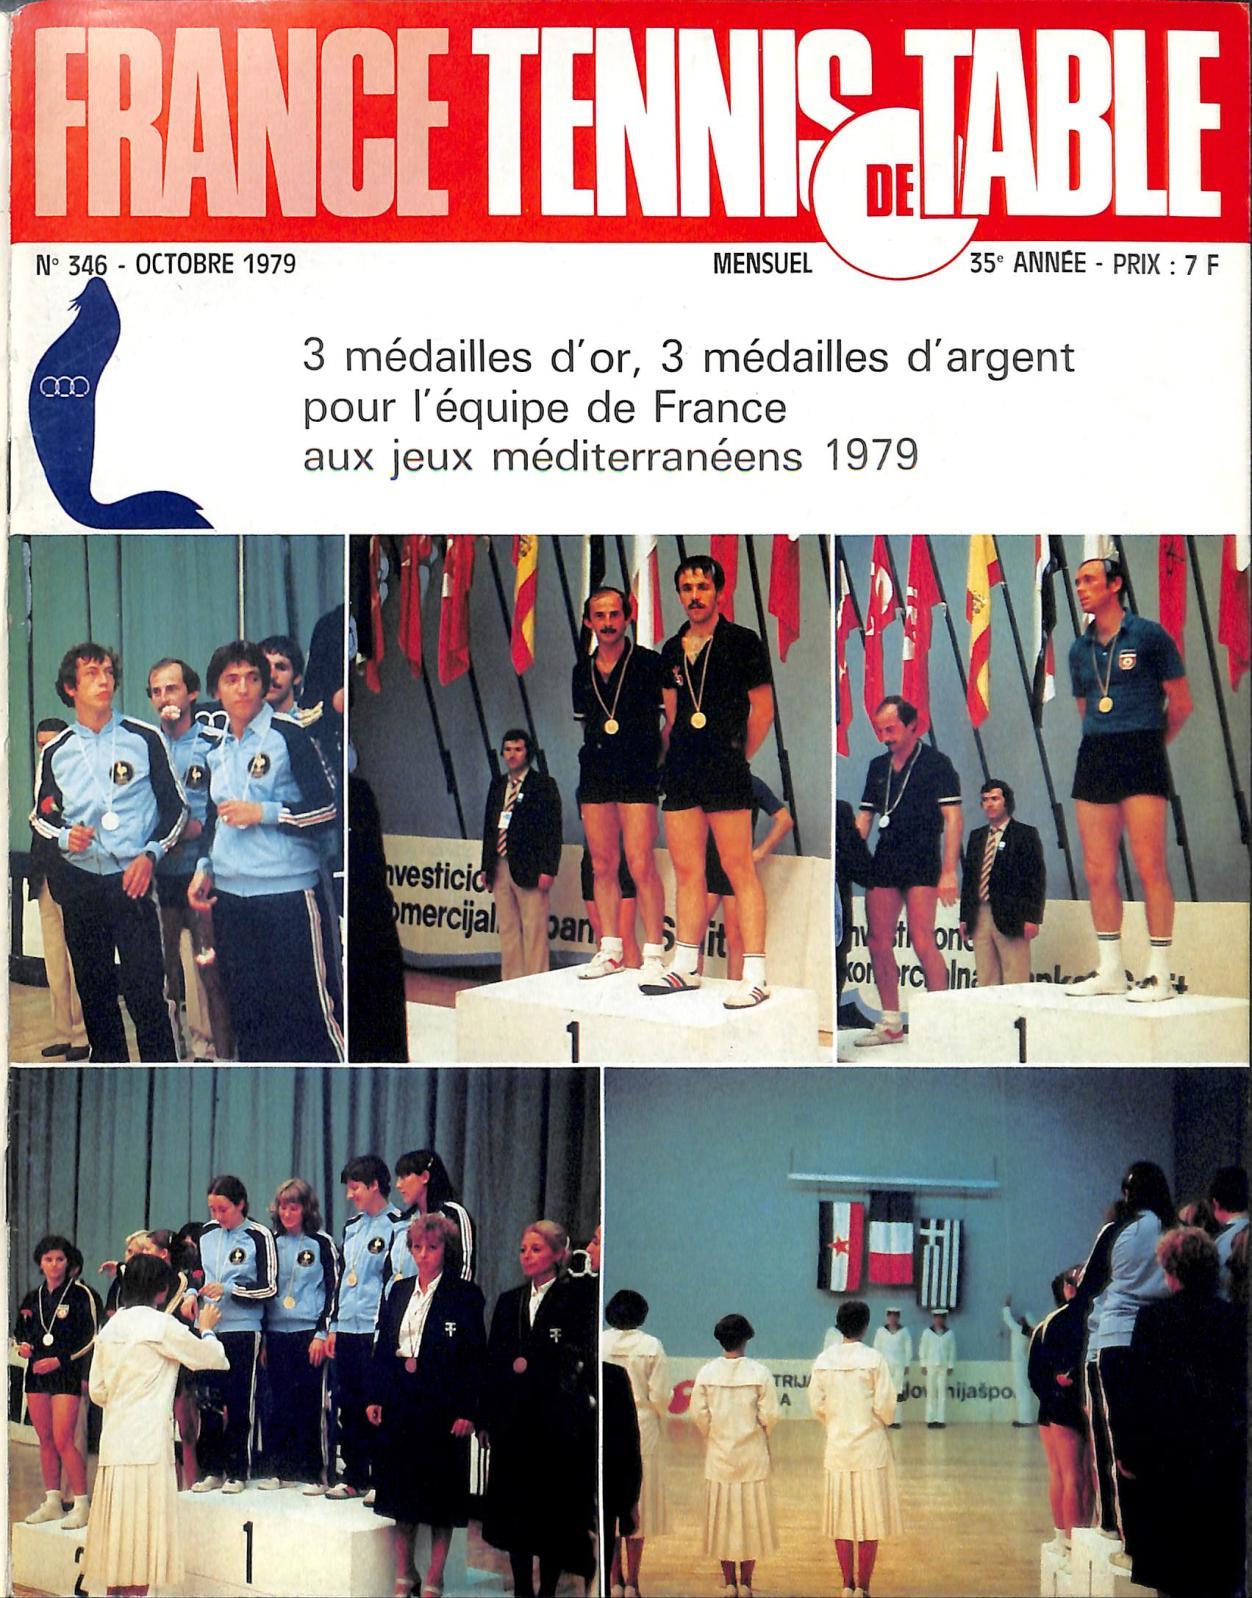 1979 France Table Calaméo Tennis De 10 346 8n0wmN